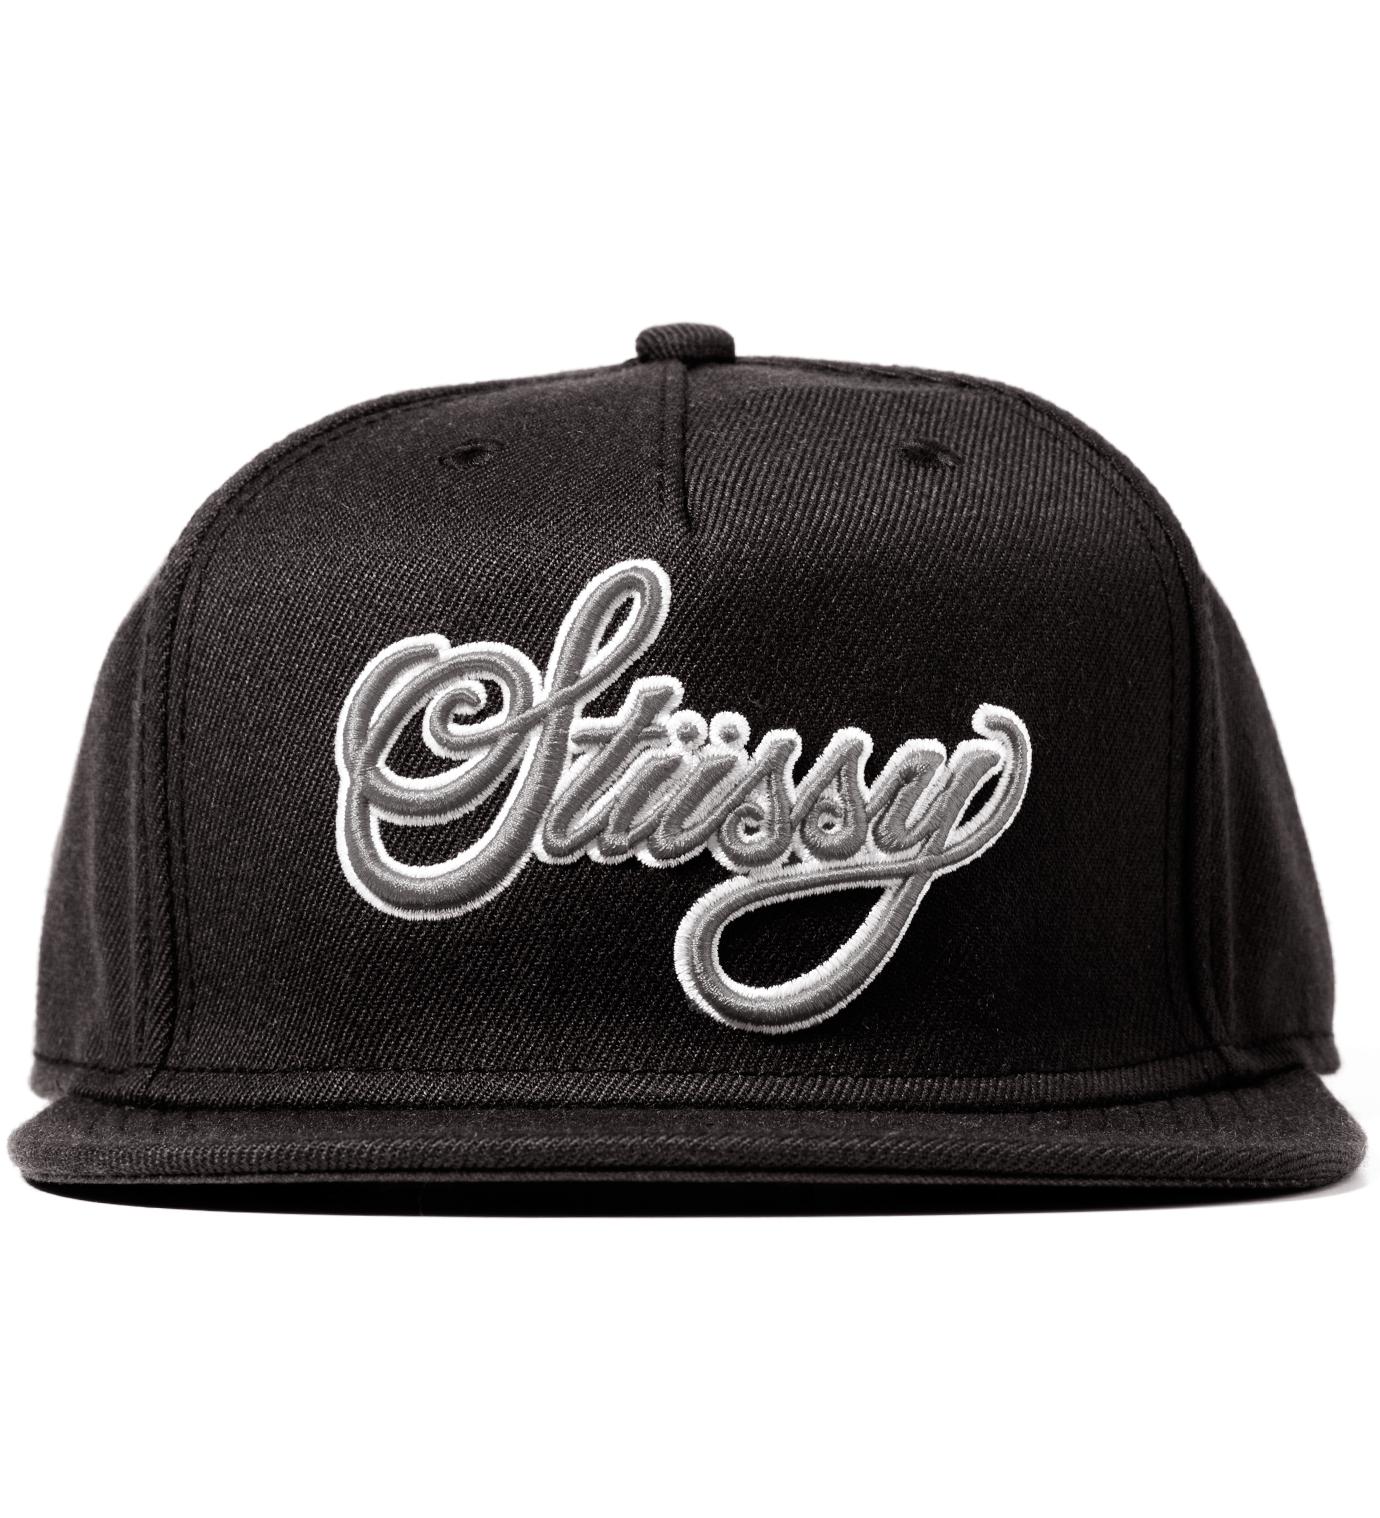 Stussy Black Team Script Snapback Ballcap